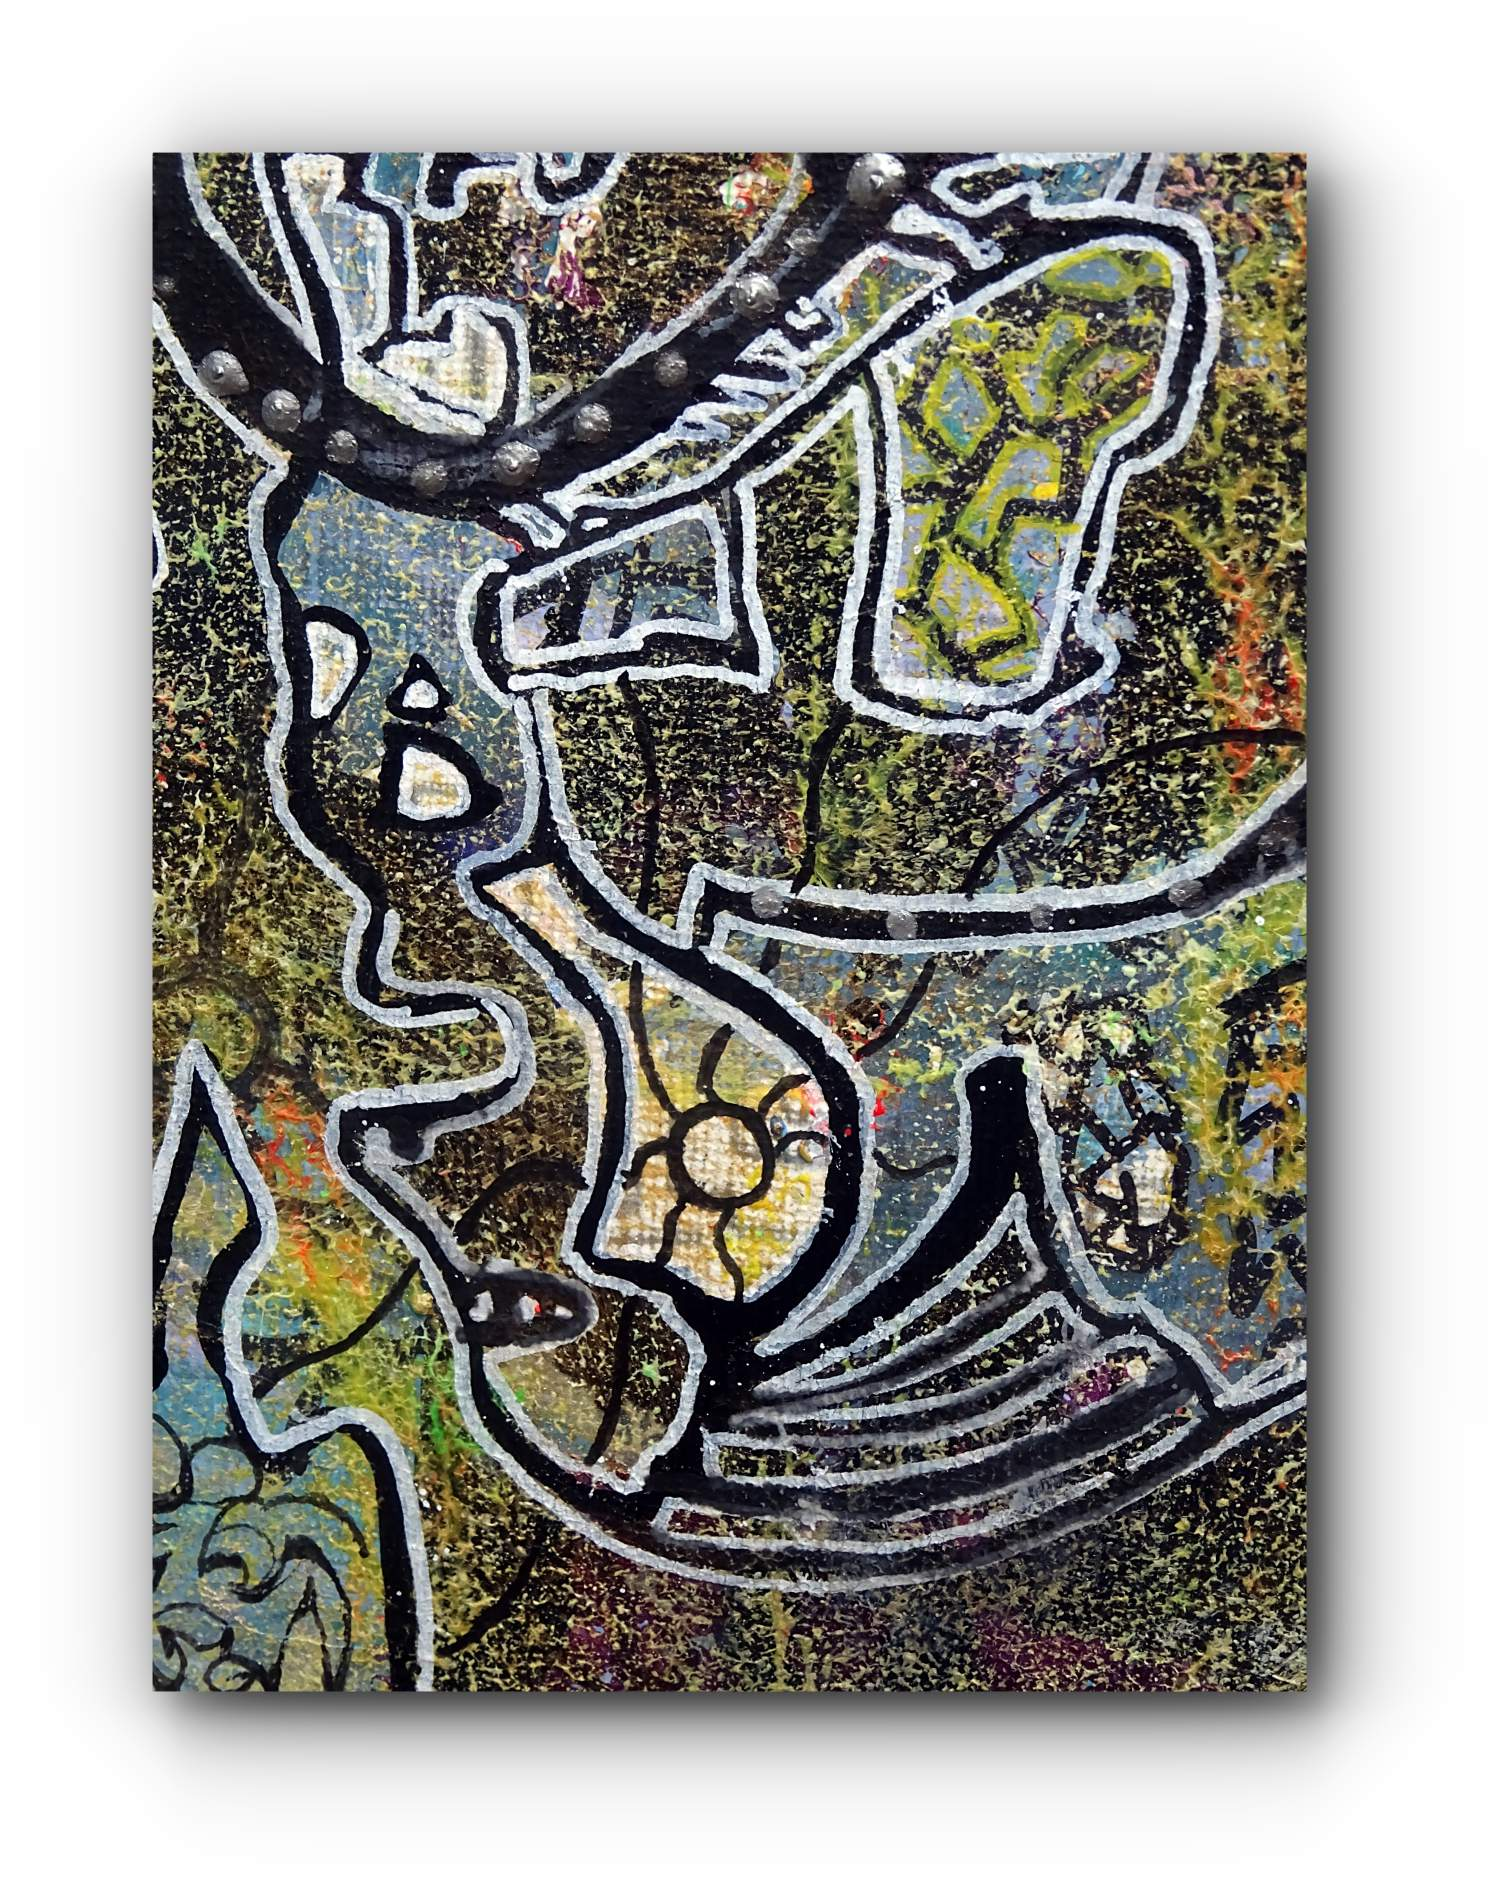 painting-detail-1-desert-dwellers-artists-ingress-vortices.jpg